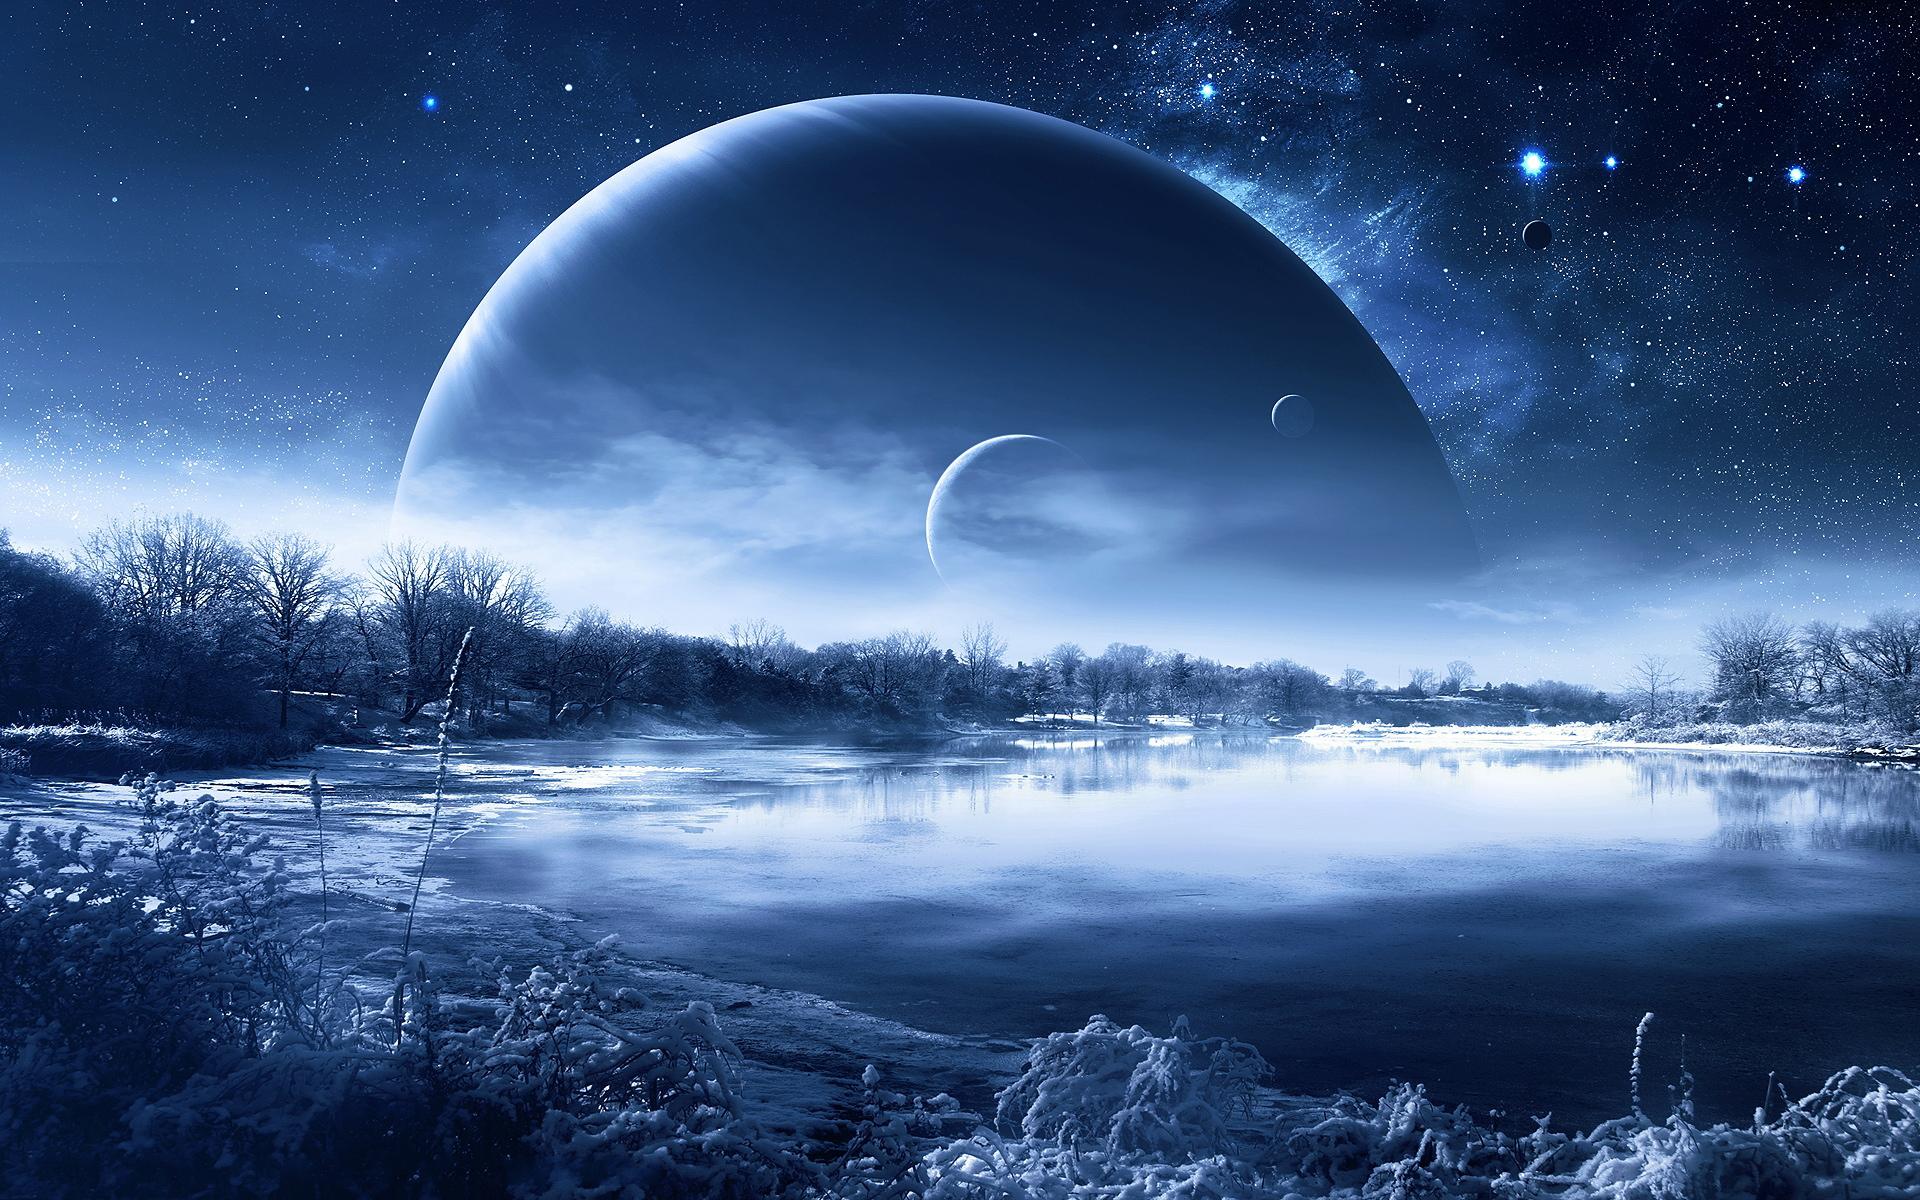 Winter Fantasy Scenery 18713 1920x1200 px